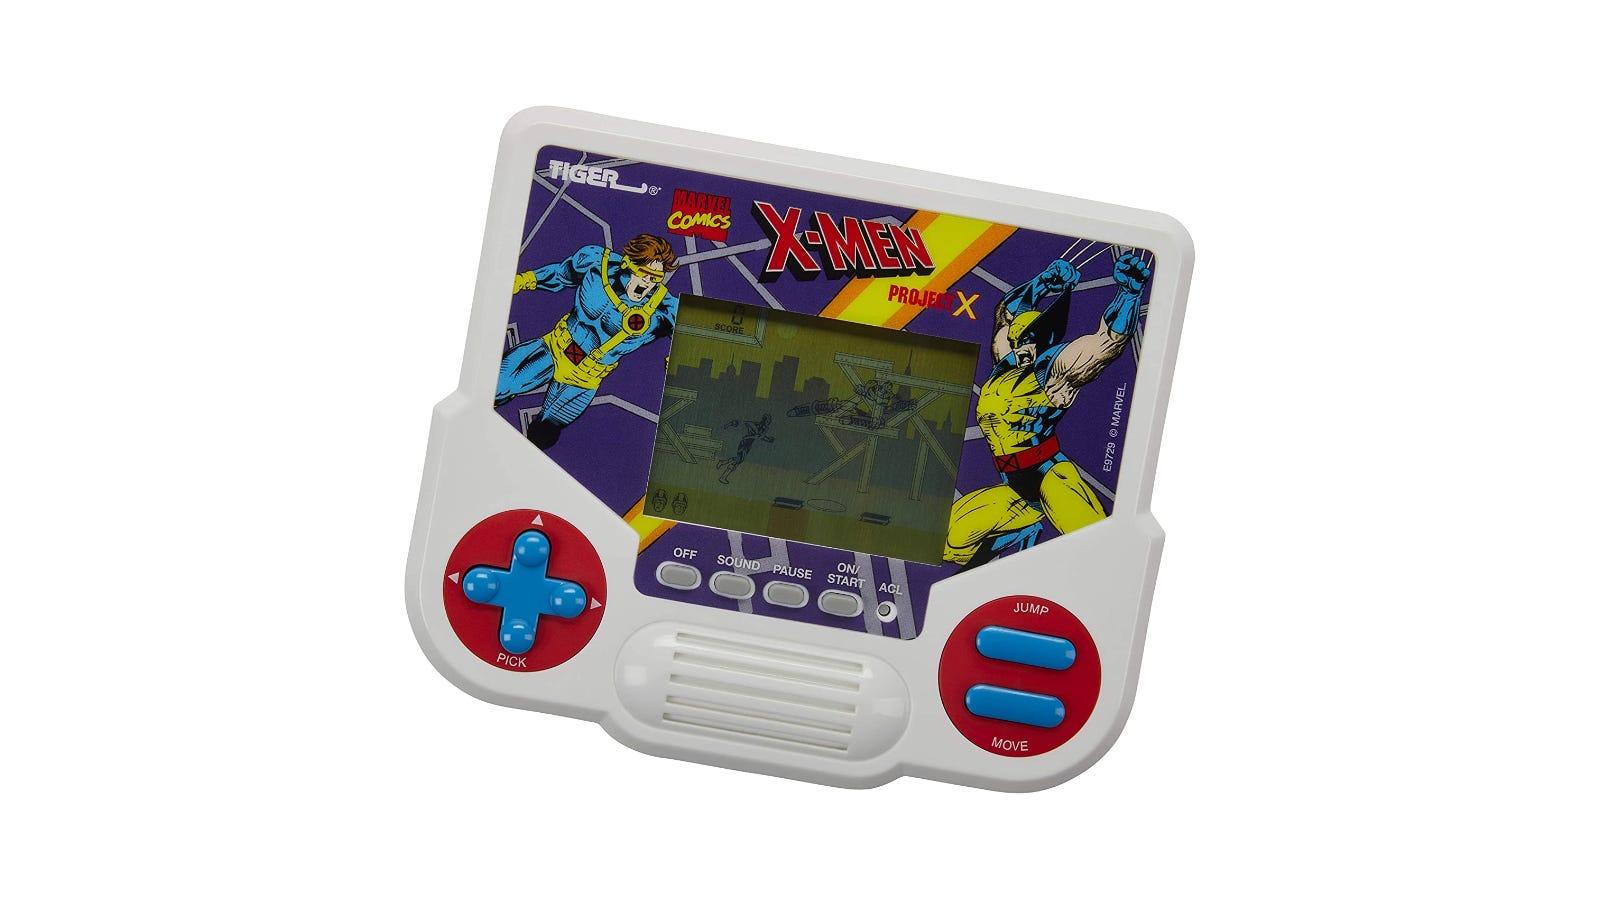 X-Men Project X Tiger Electronics Handheld